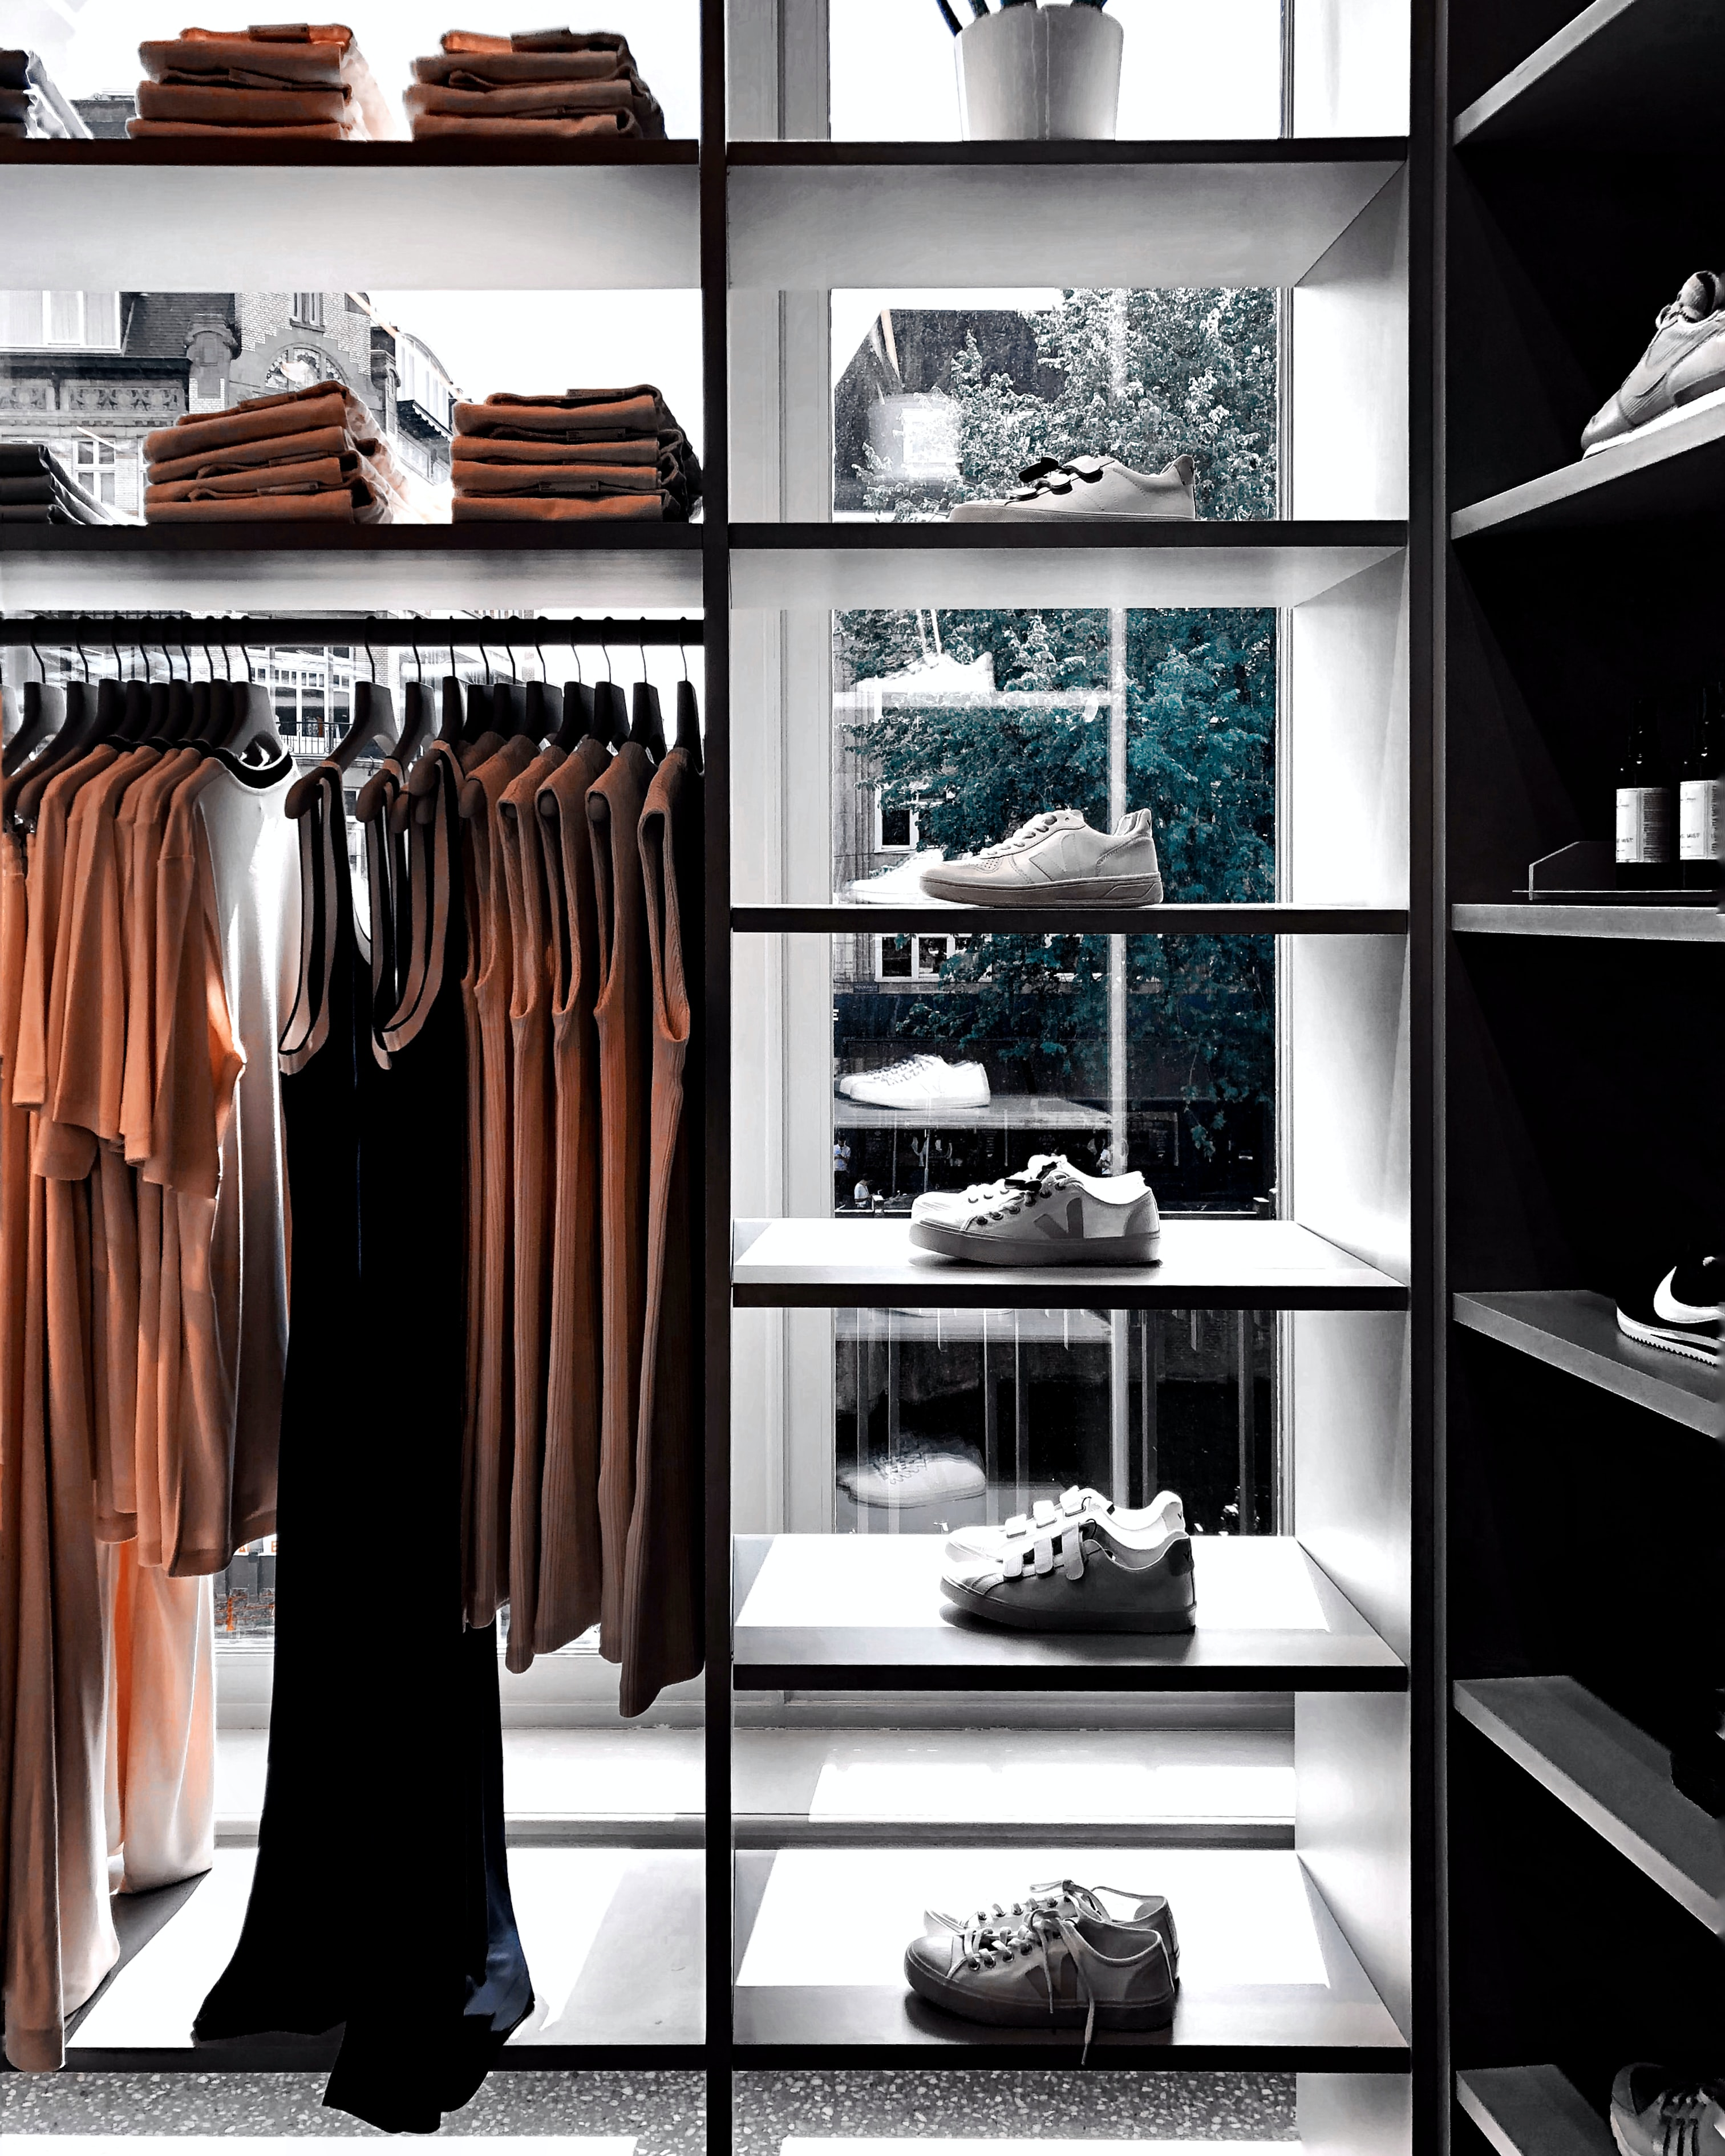 A breath of fresh air for sales